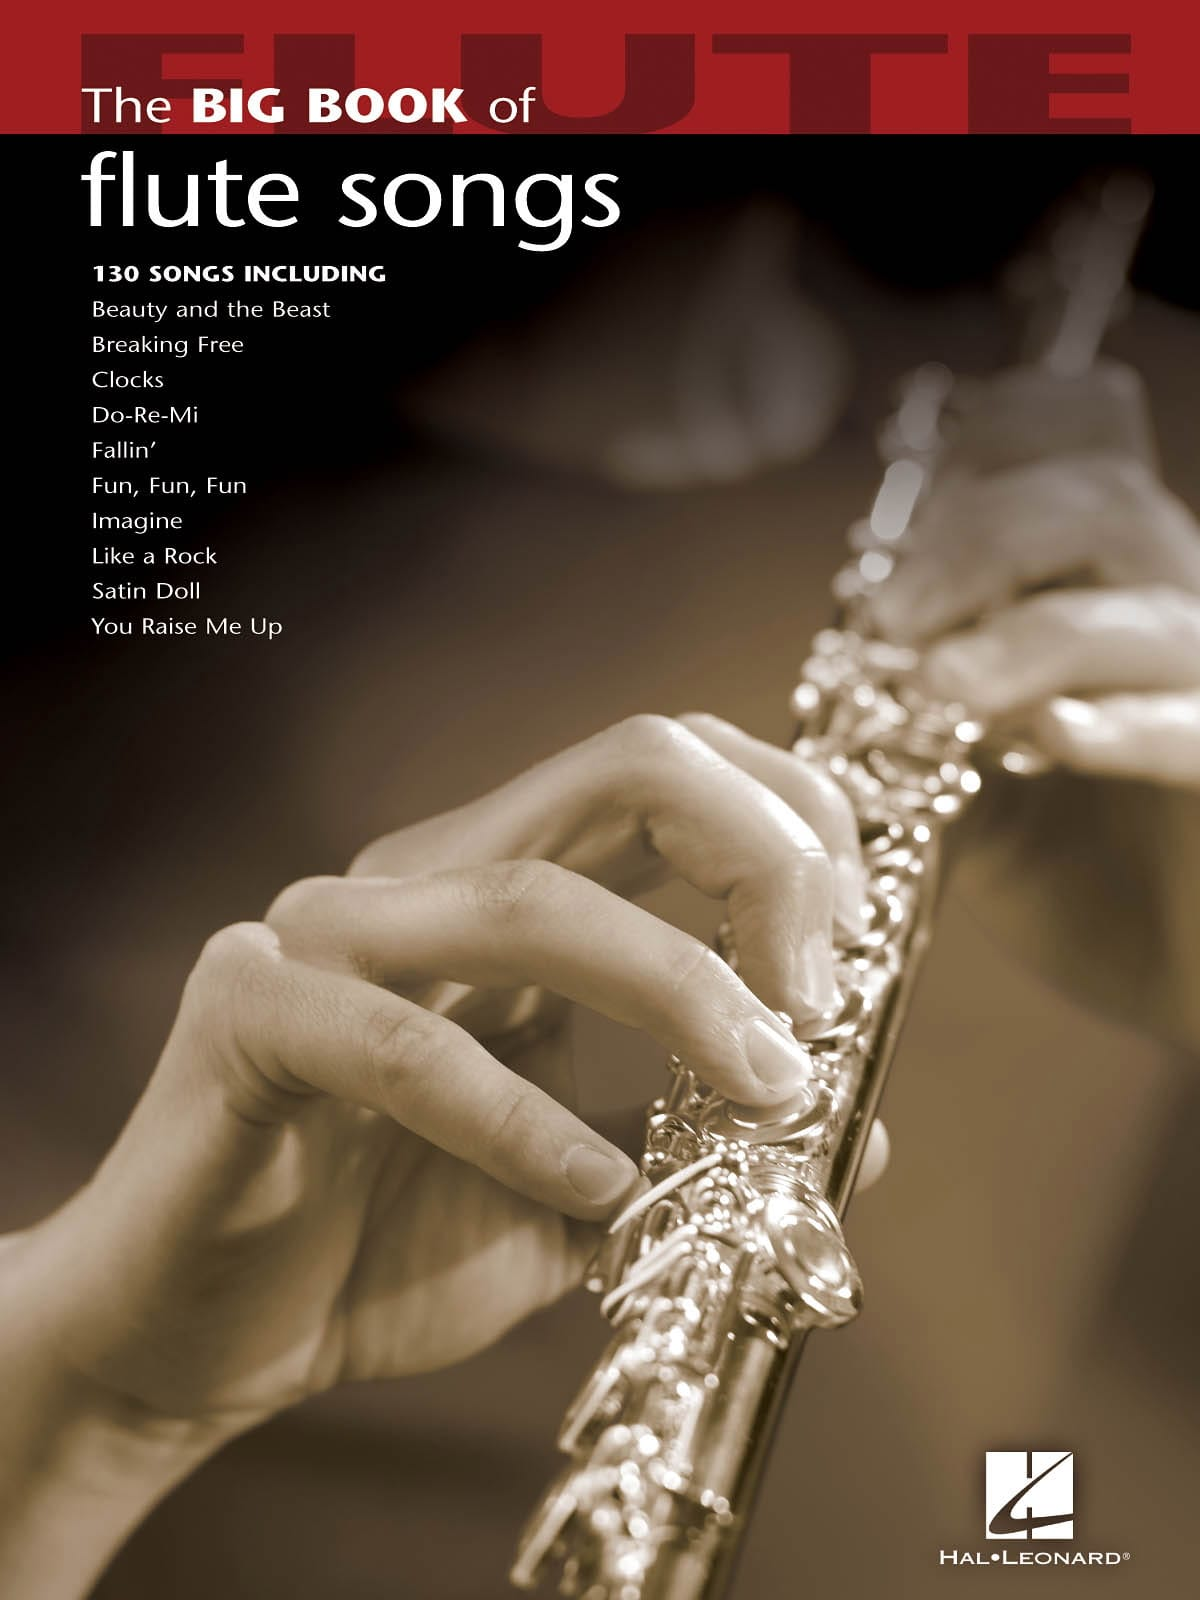 The Big Book of Flute Songs - Partition - laflutedepan.com